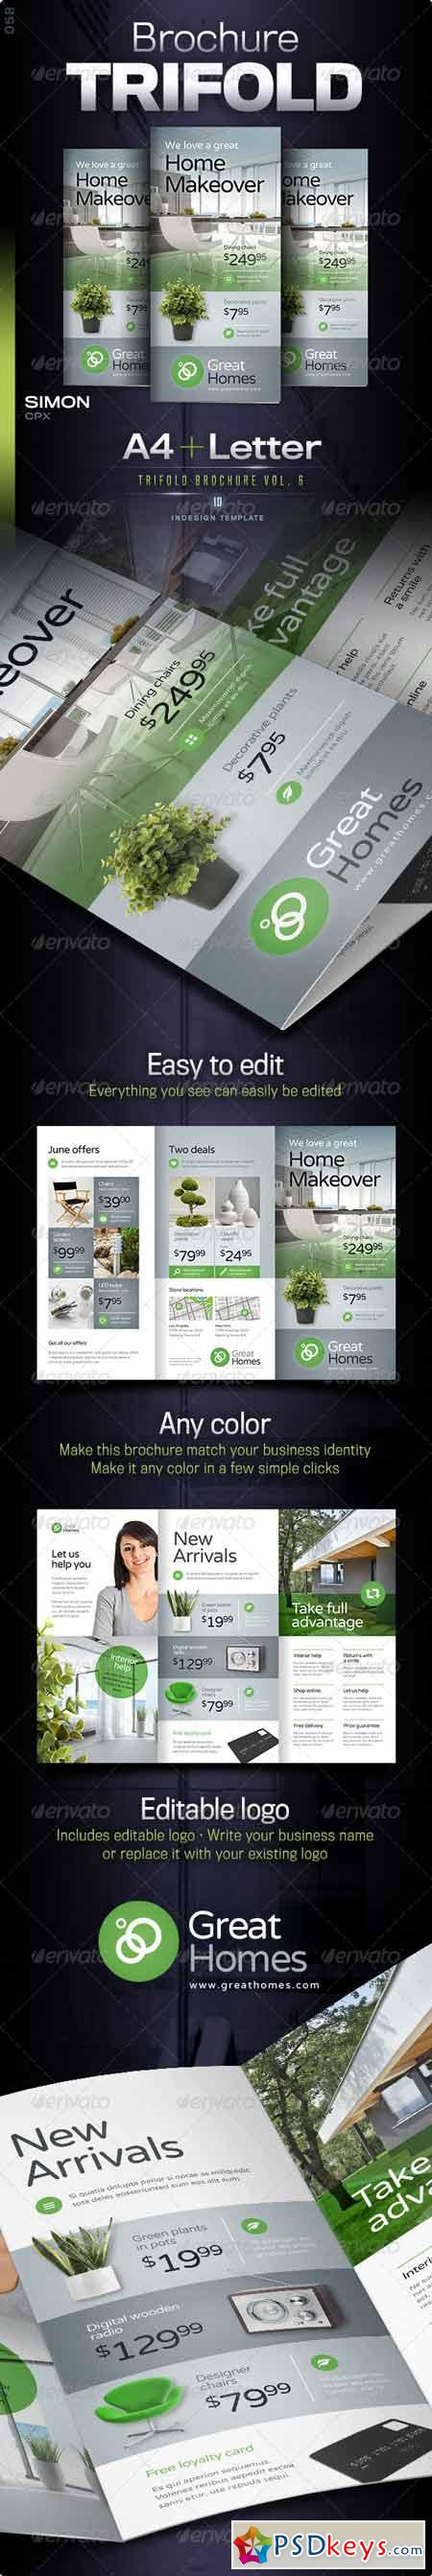 Trifold Brochure Vol 6 8164360